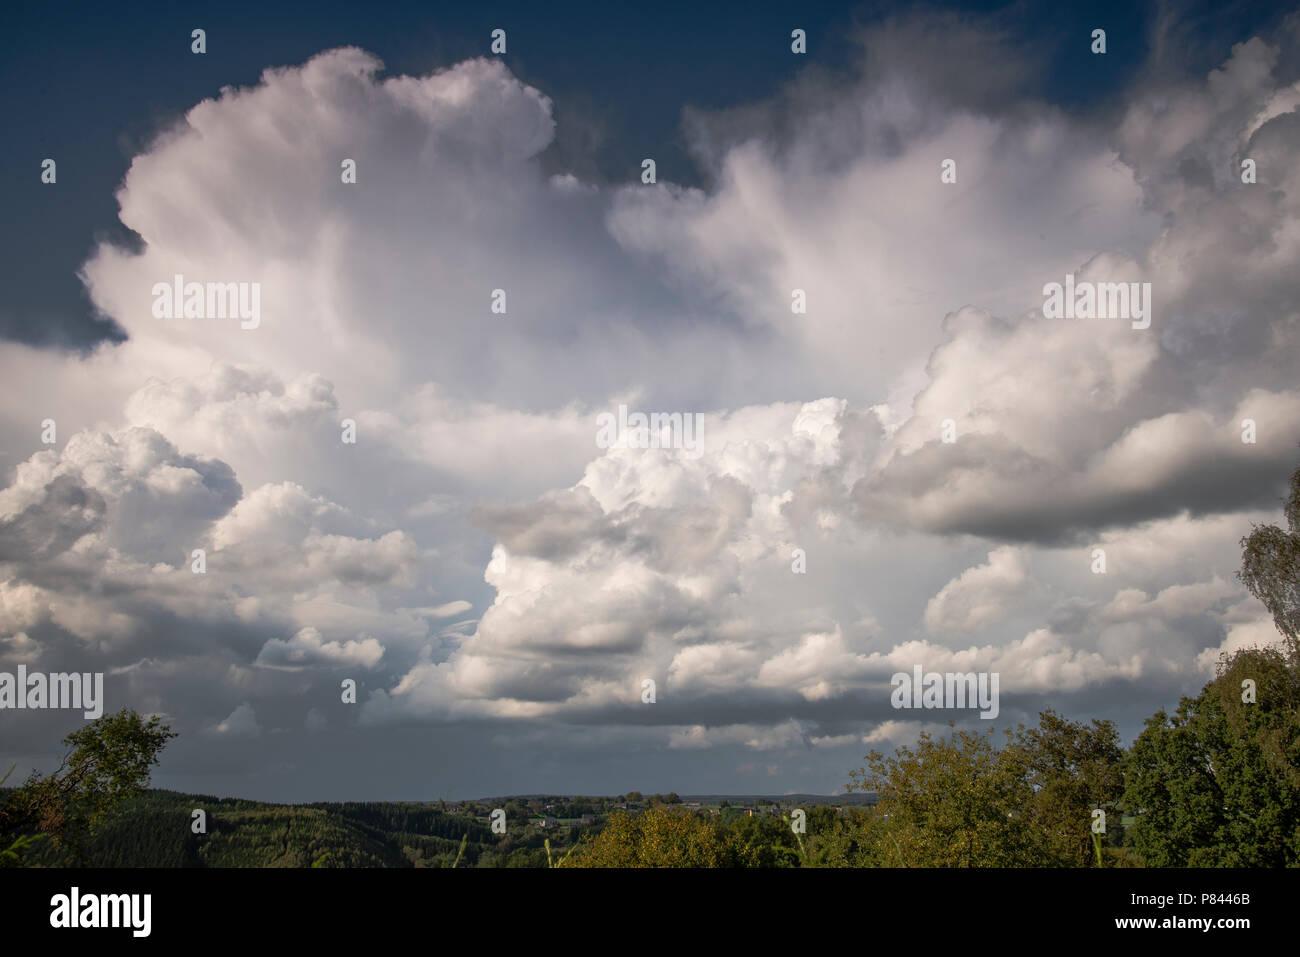 Cumulonimbus bewolking Ardennen, Cumulonimbus clouds Ardennes - Stock Image